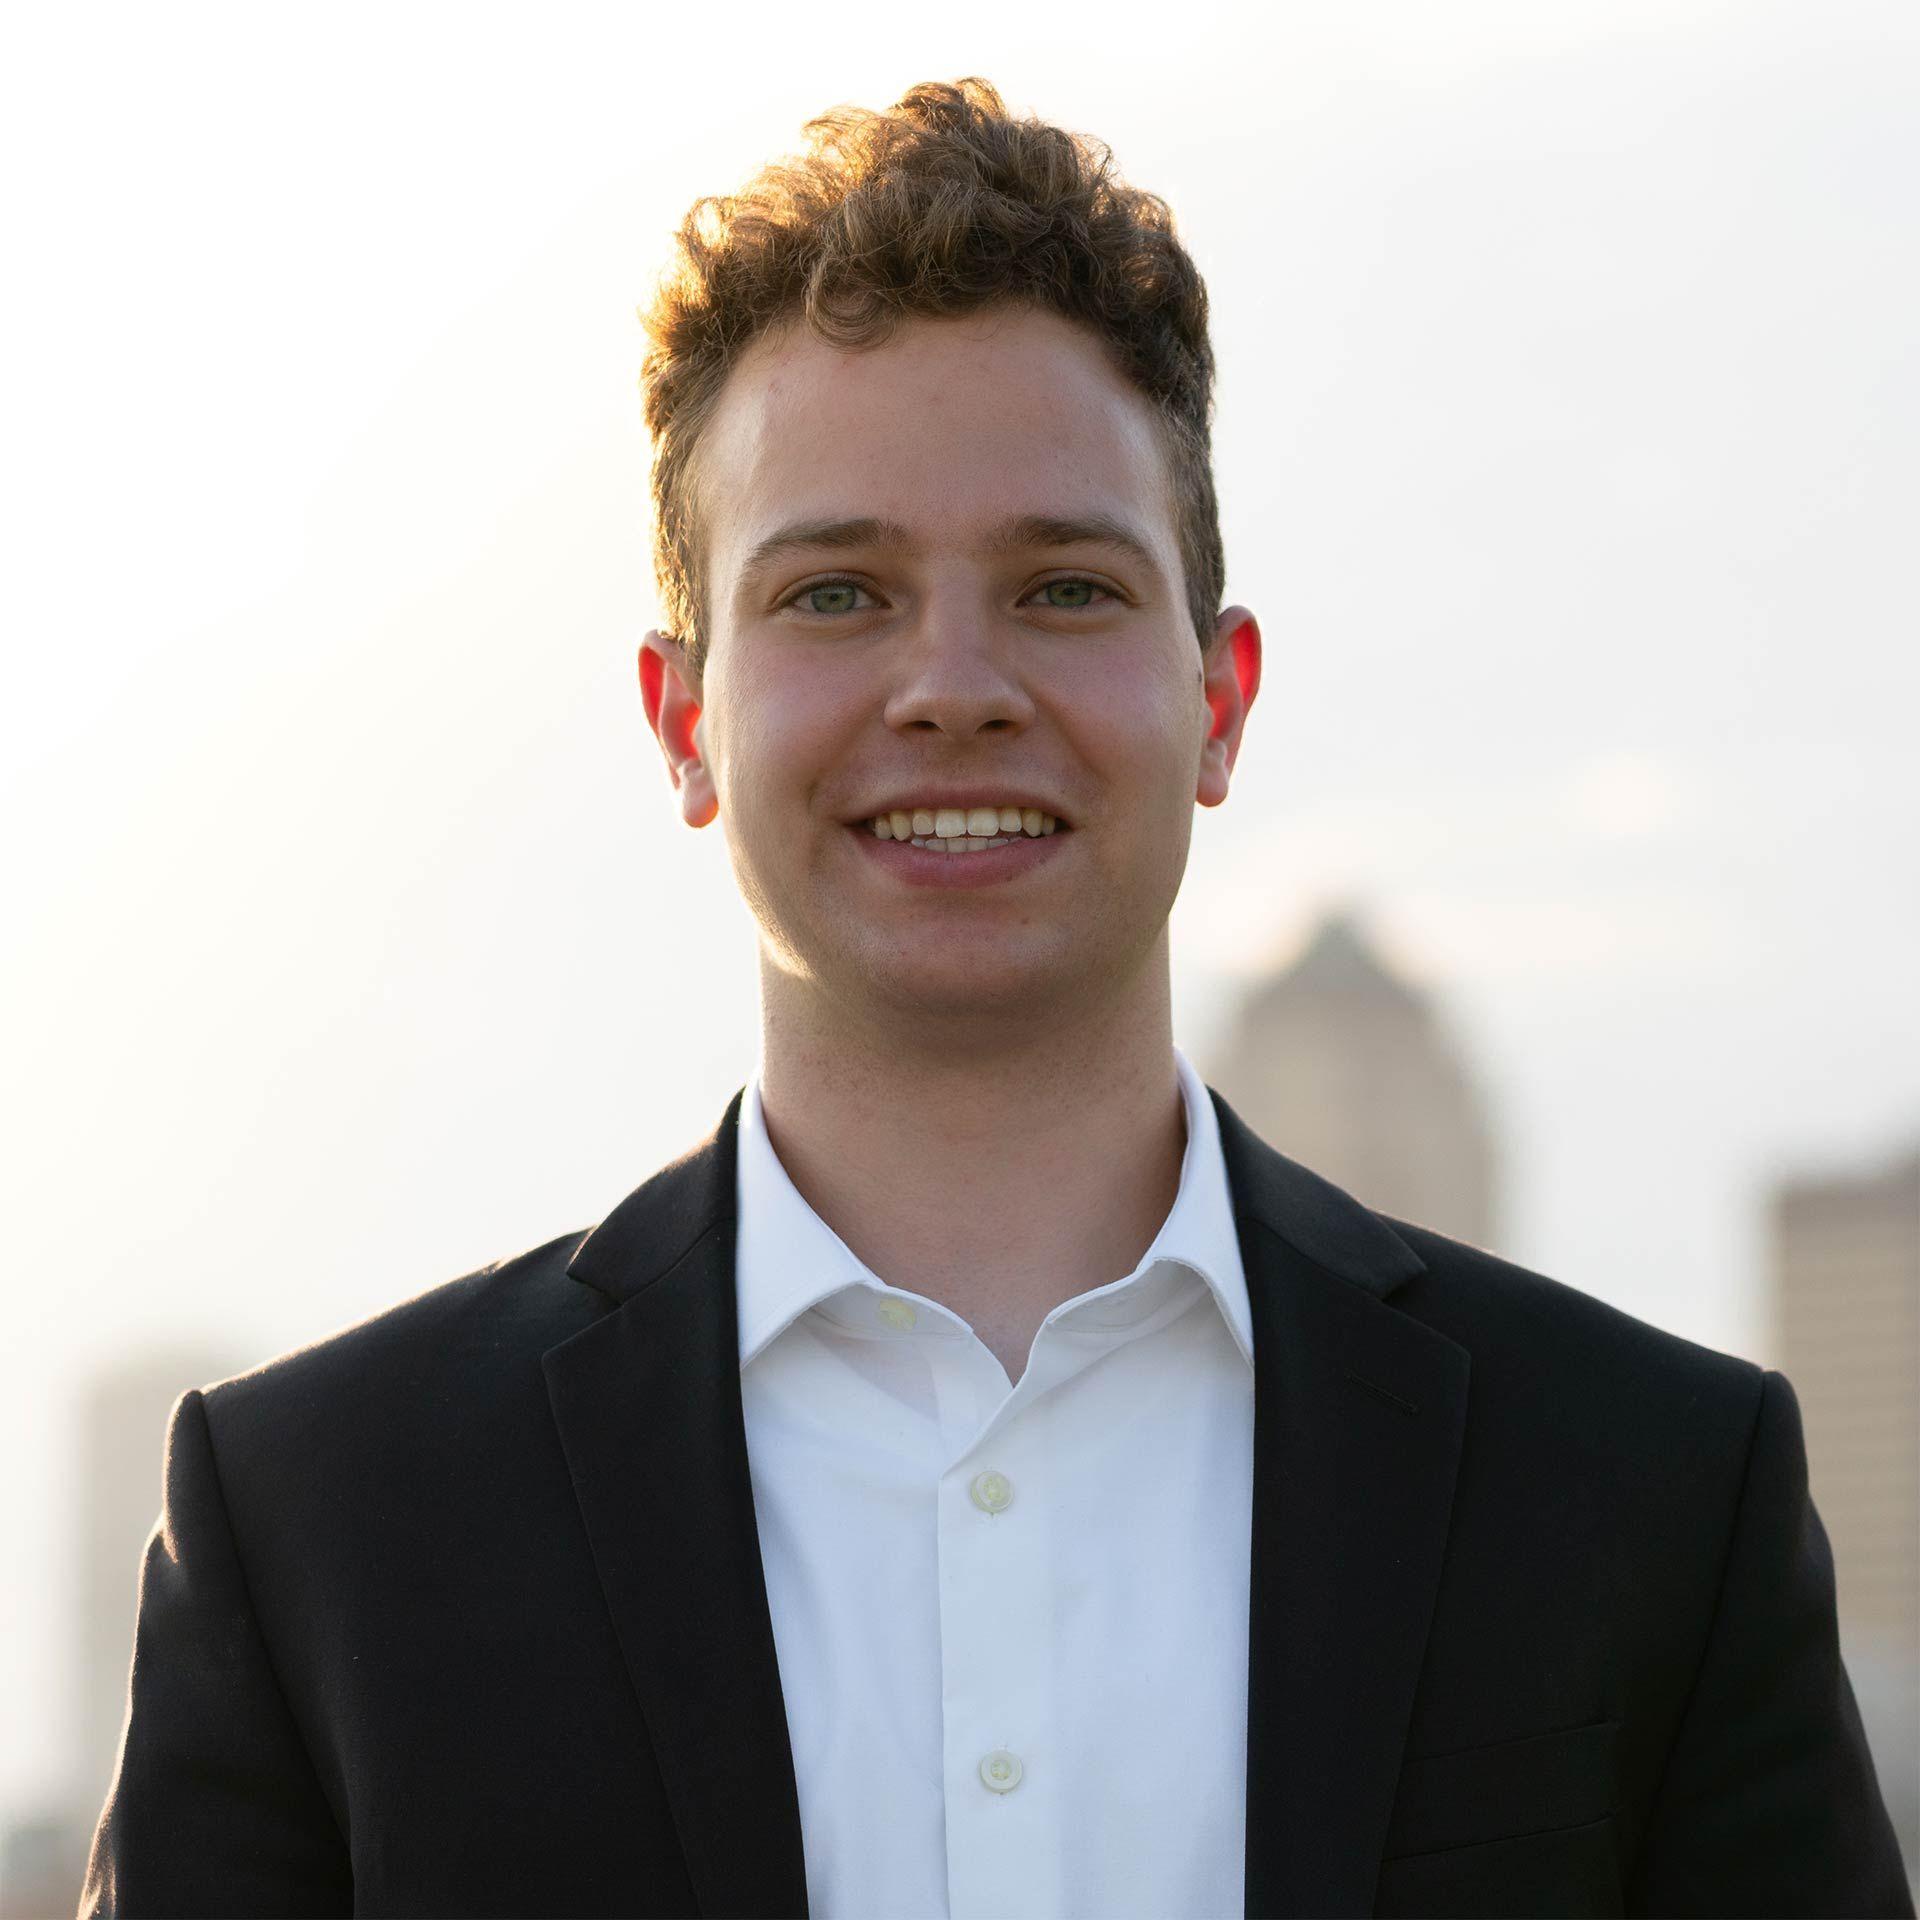 Jonathan Hacker Noon profile picture